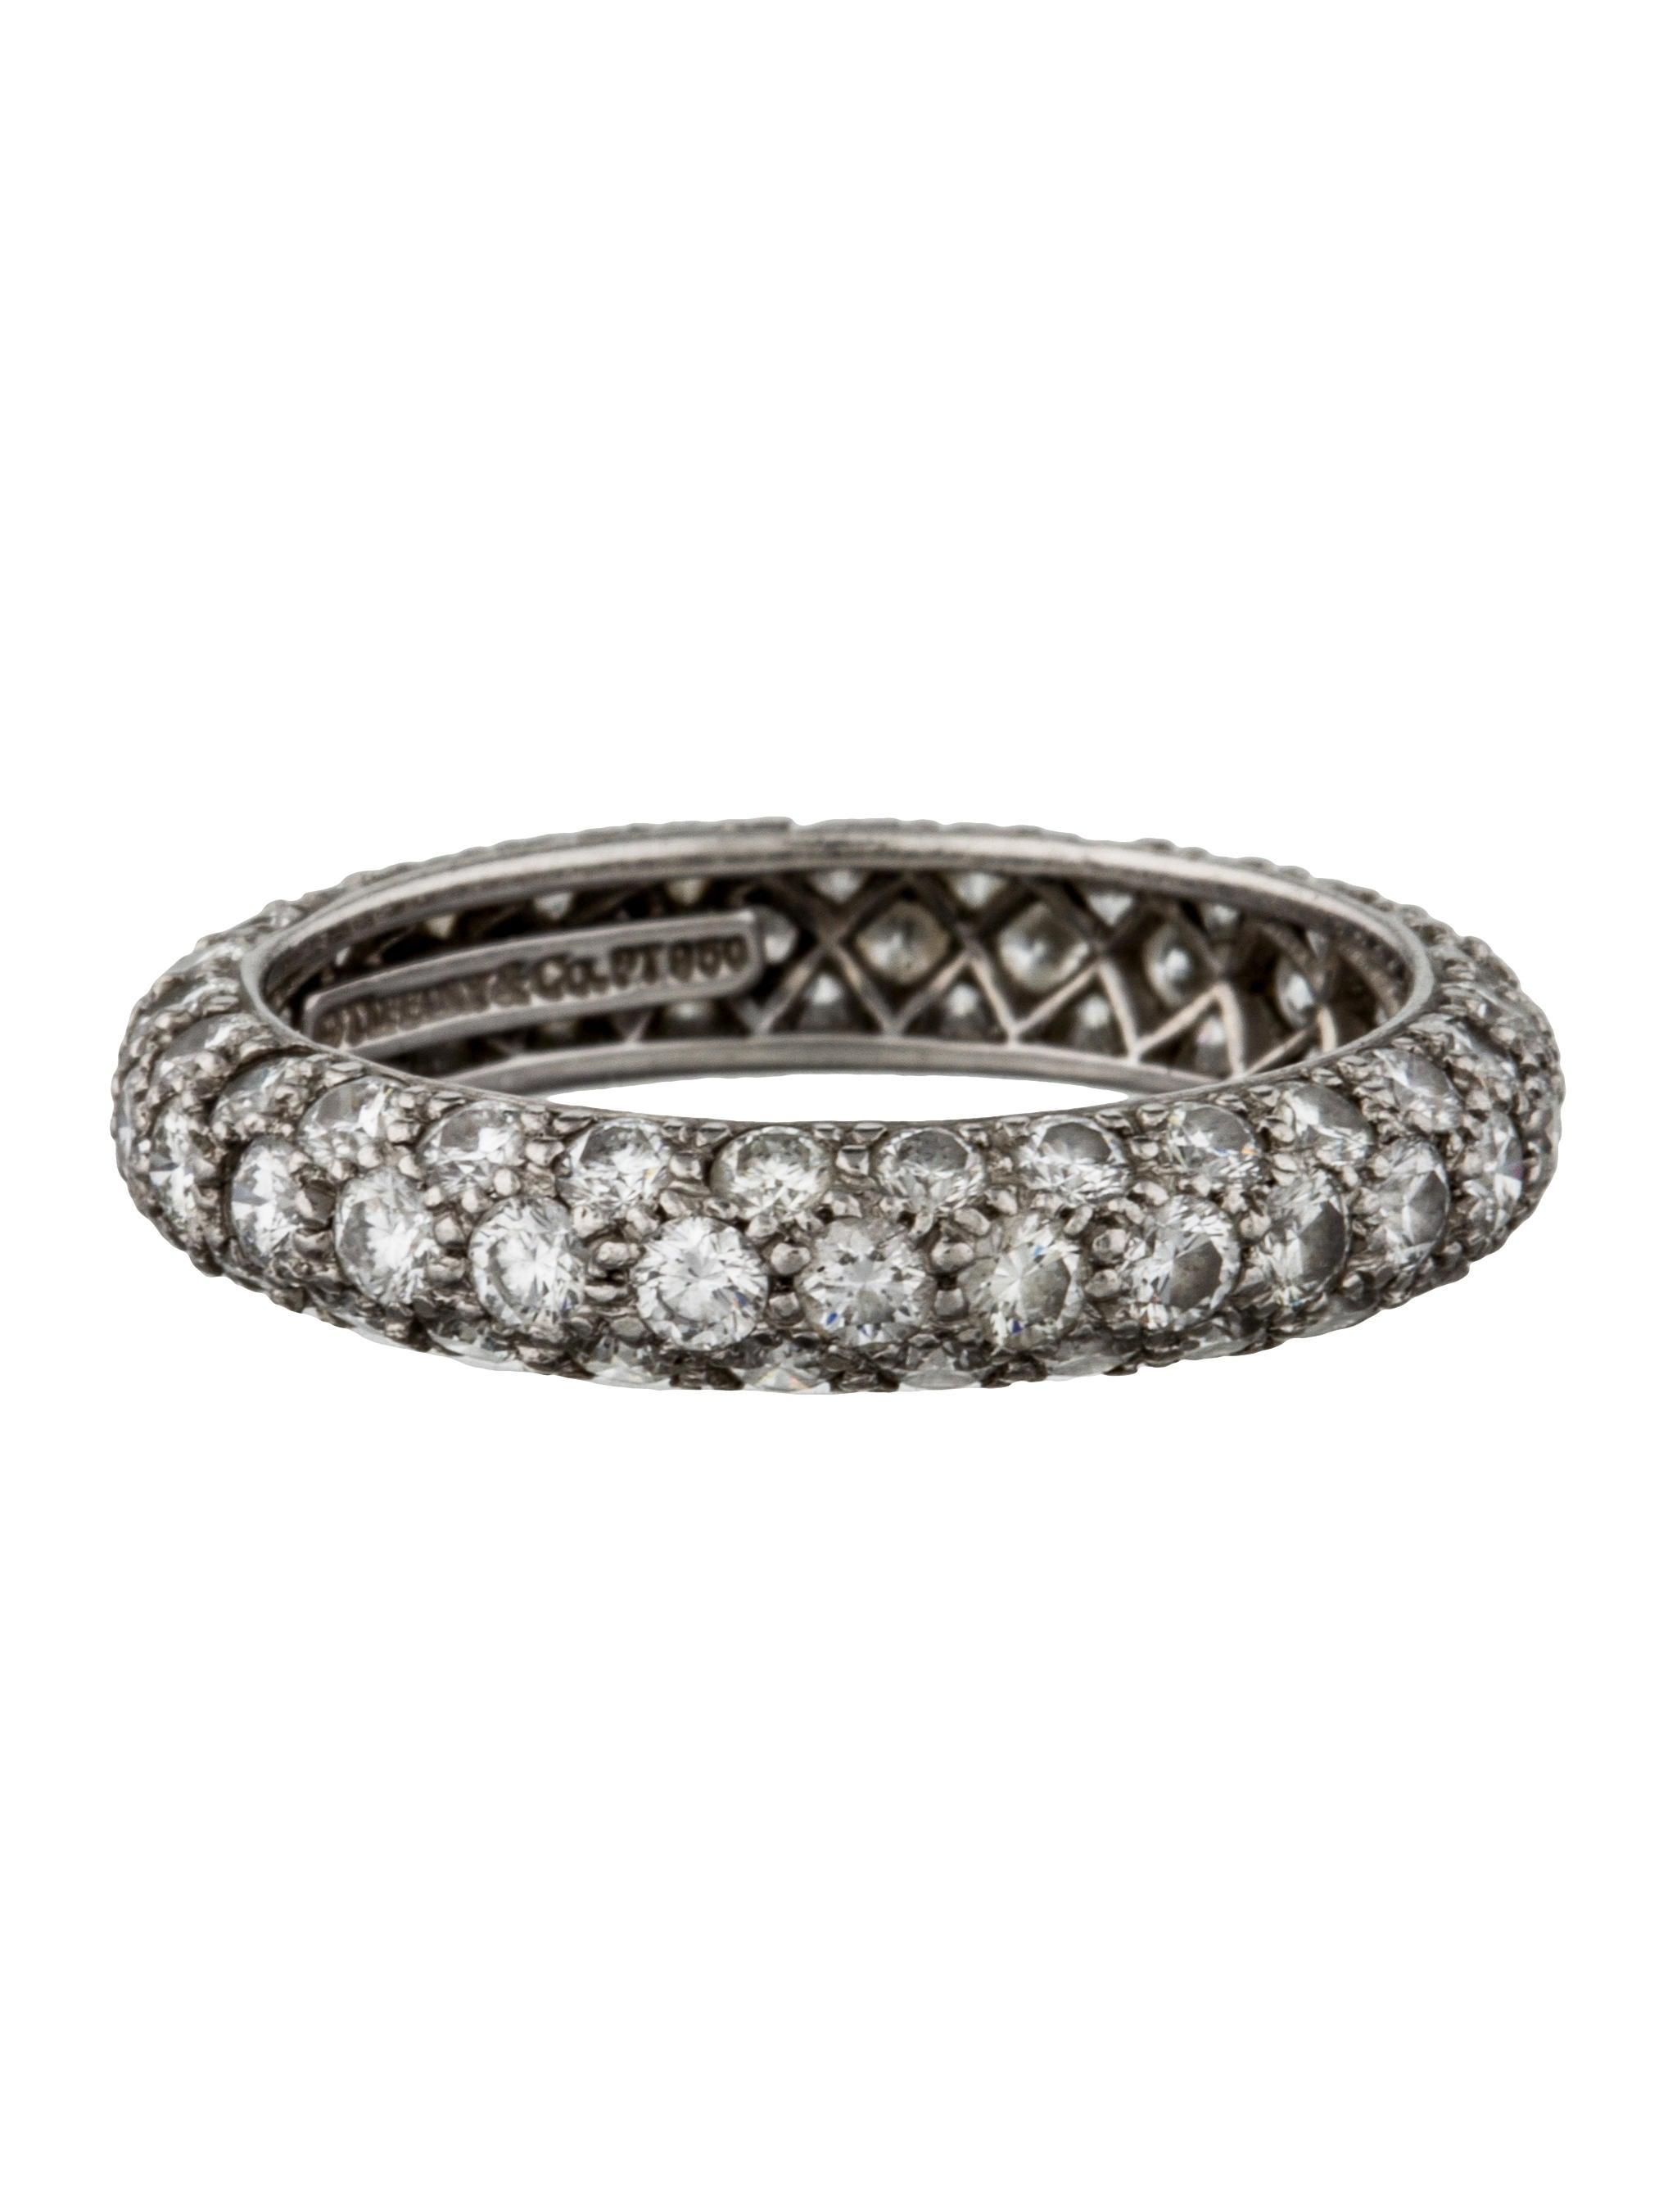 Tiffany Amp Co Etoile Three Row Band Rings Tif34577